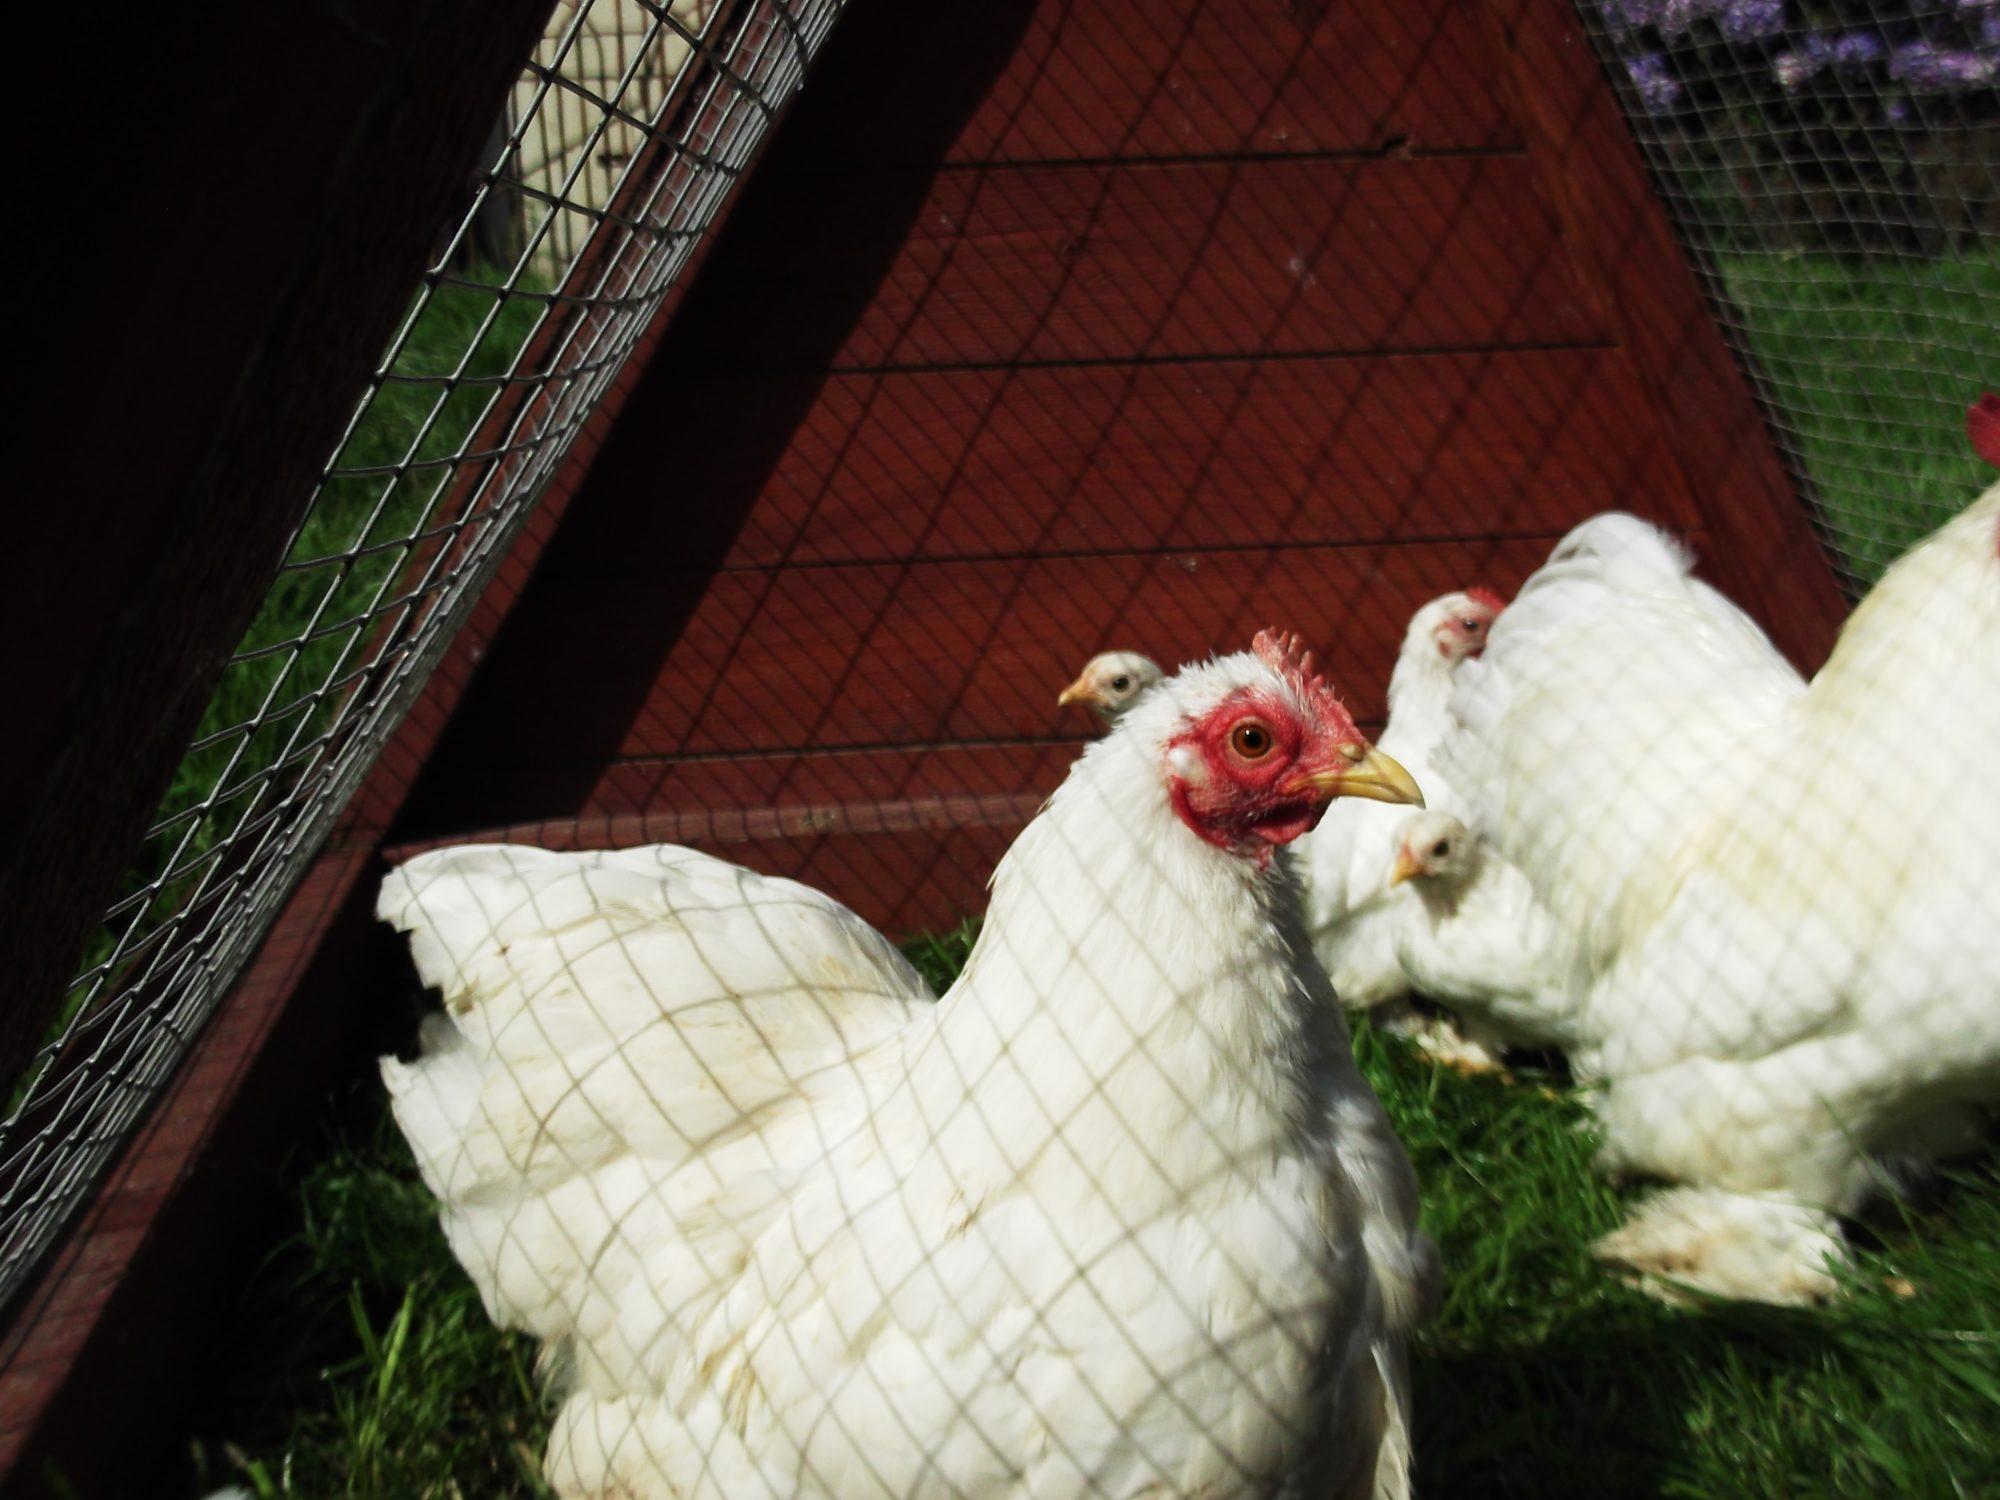 chickencrazy989